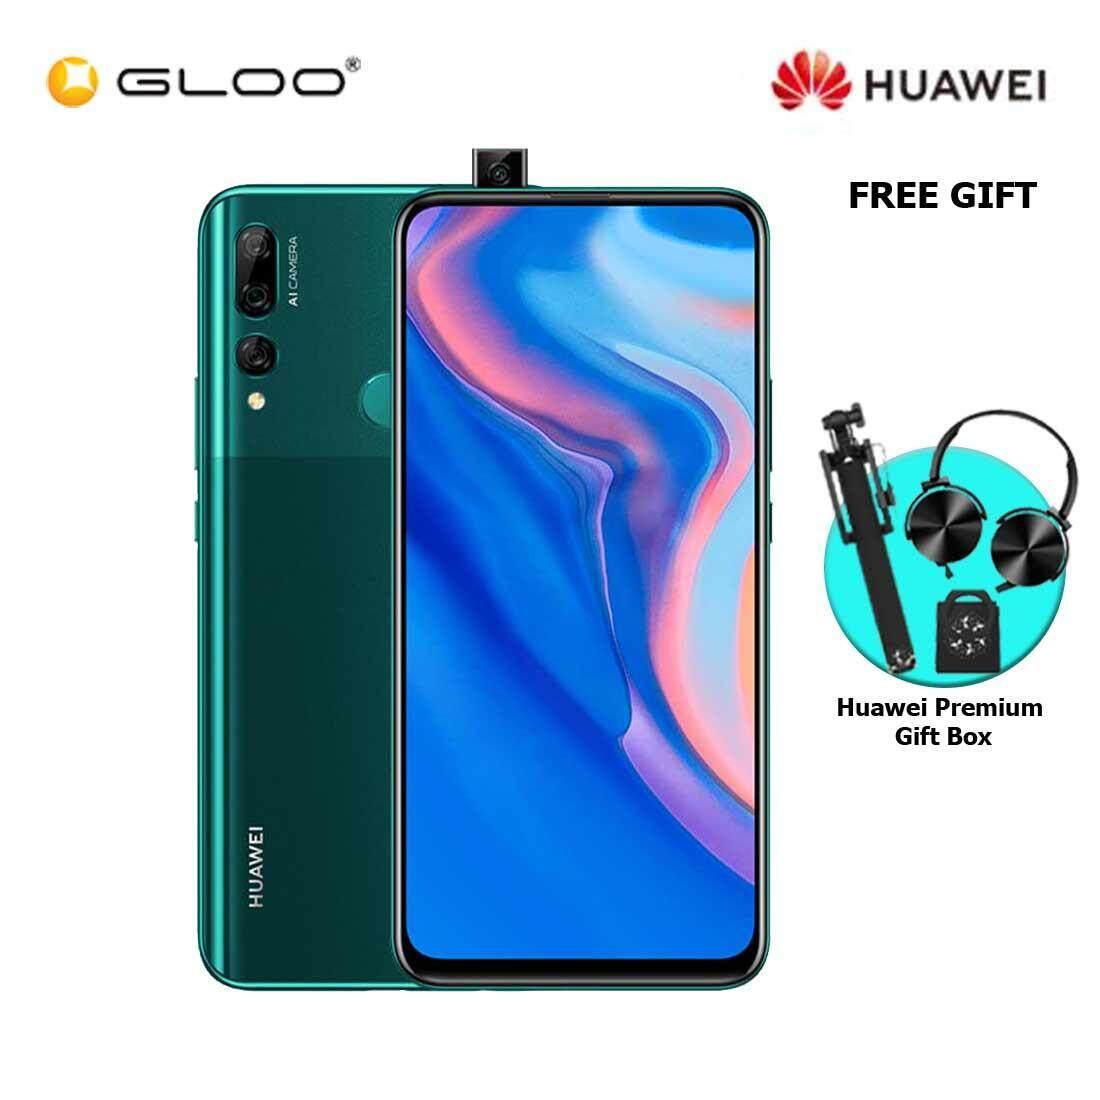 Huawei Y9 Prime 2019 4GB+128GB Emerald Green + FREE Premium Gift Box (Headset/Selfie Stick/iRing)